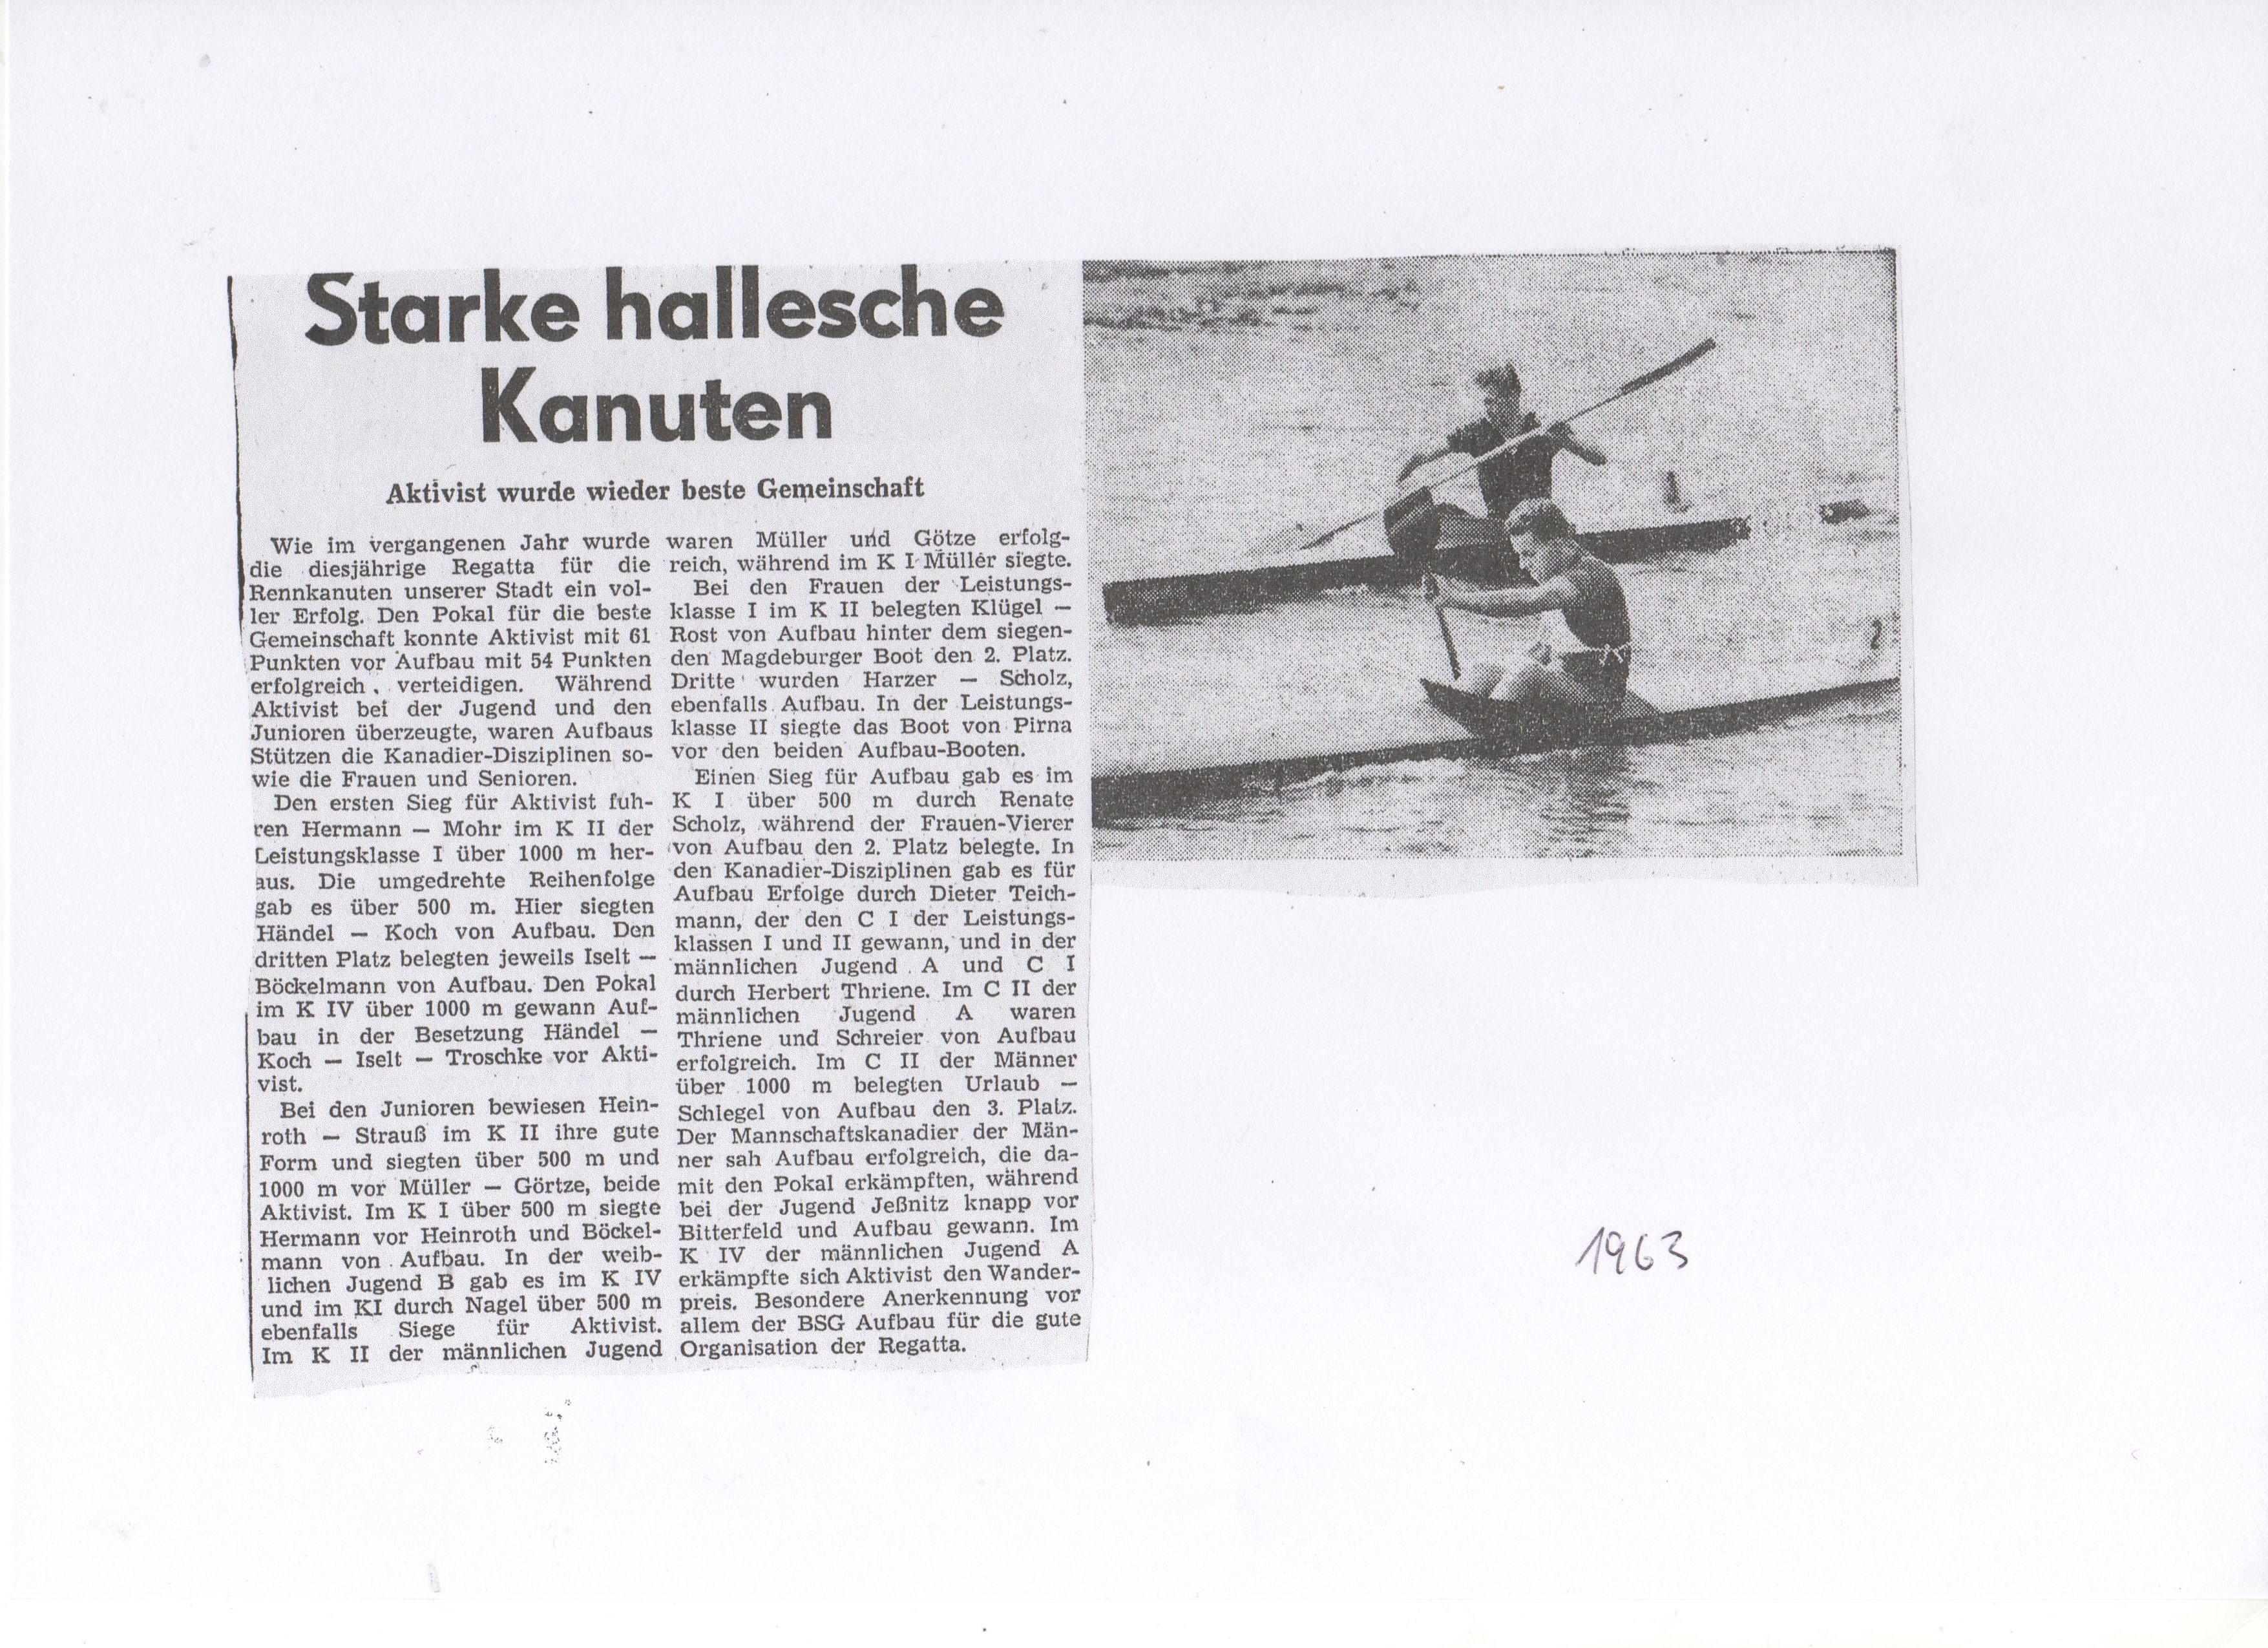 1963 Starke hallesche Kanuten